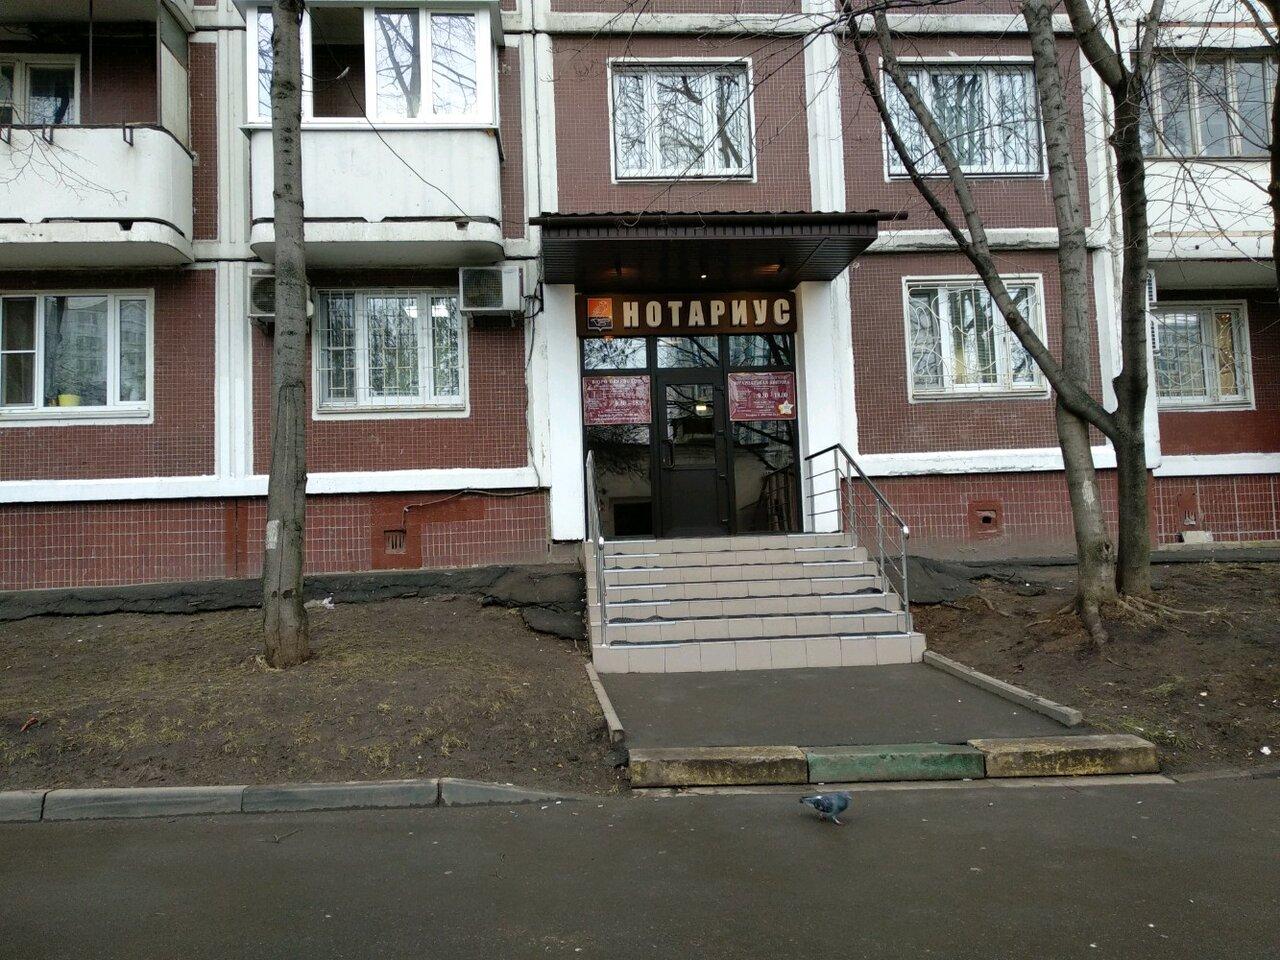 Офис нотариуса Кравченко А А